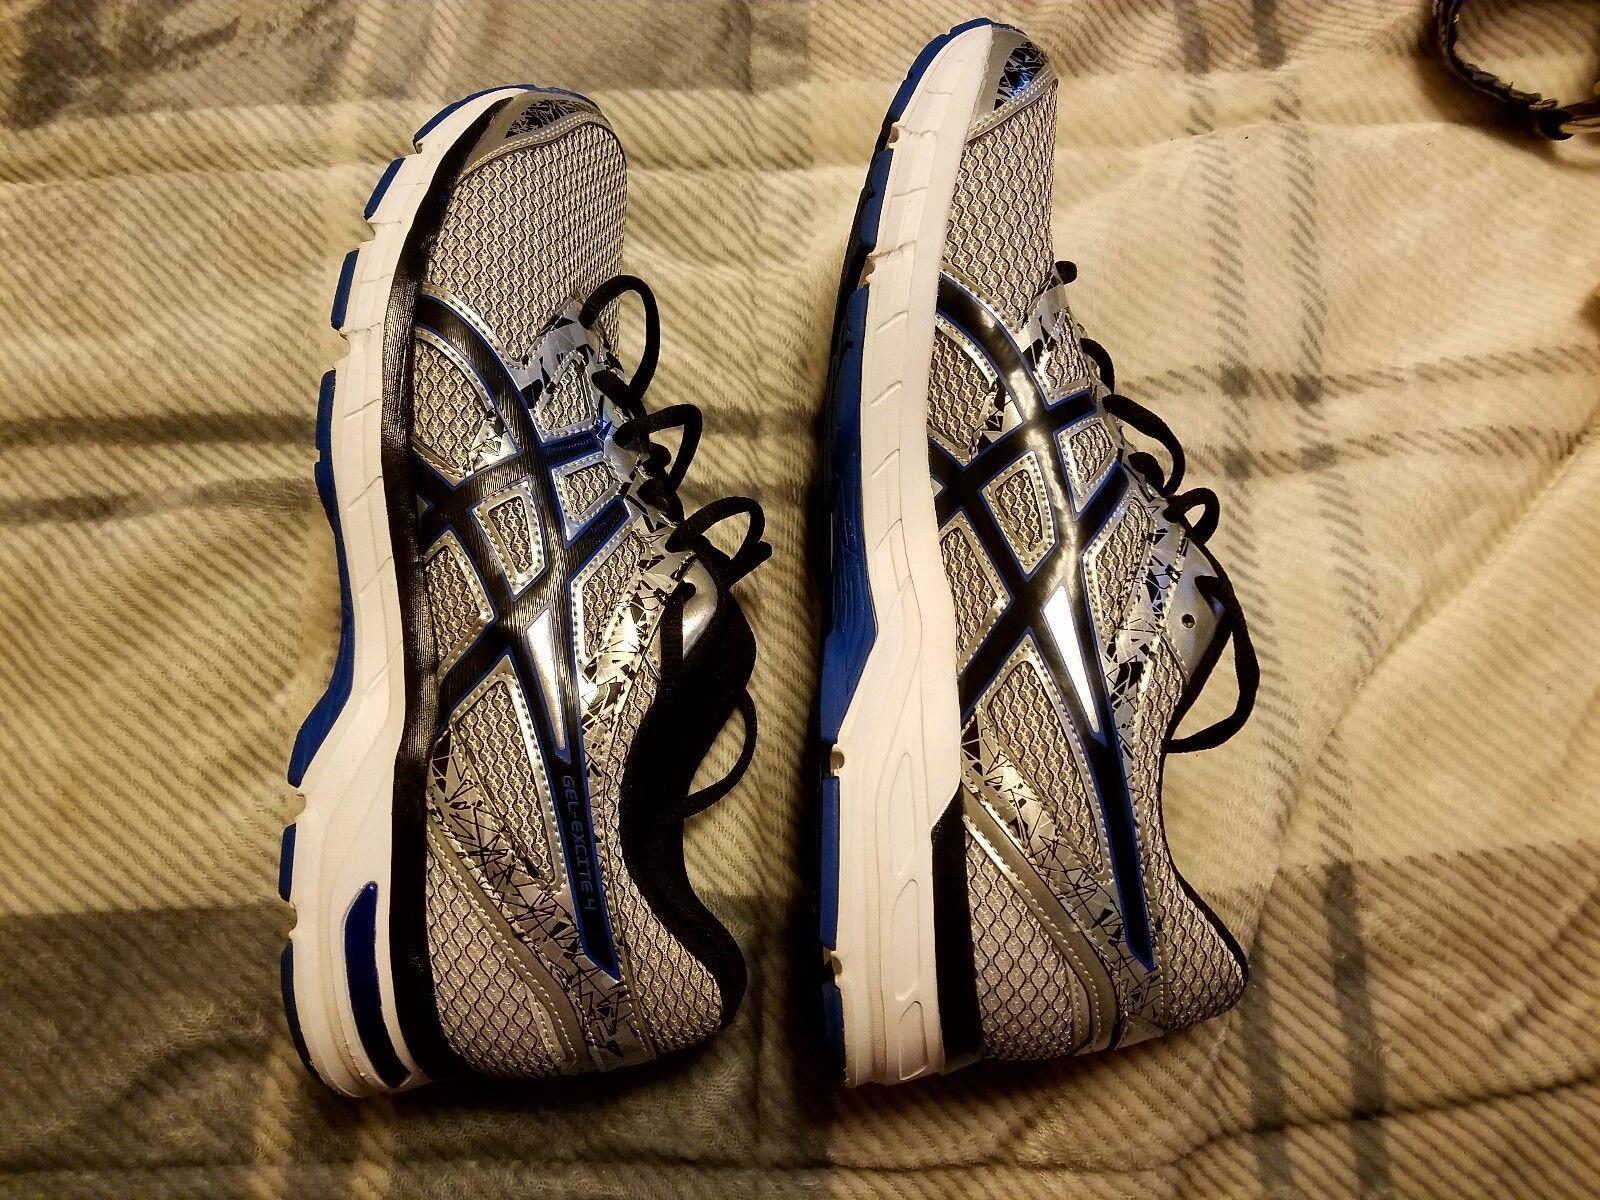 Asics Gel-Excite 4 Men Black US 10 1/2 Silver/Blue & Black Men Sneakers 3c3f10